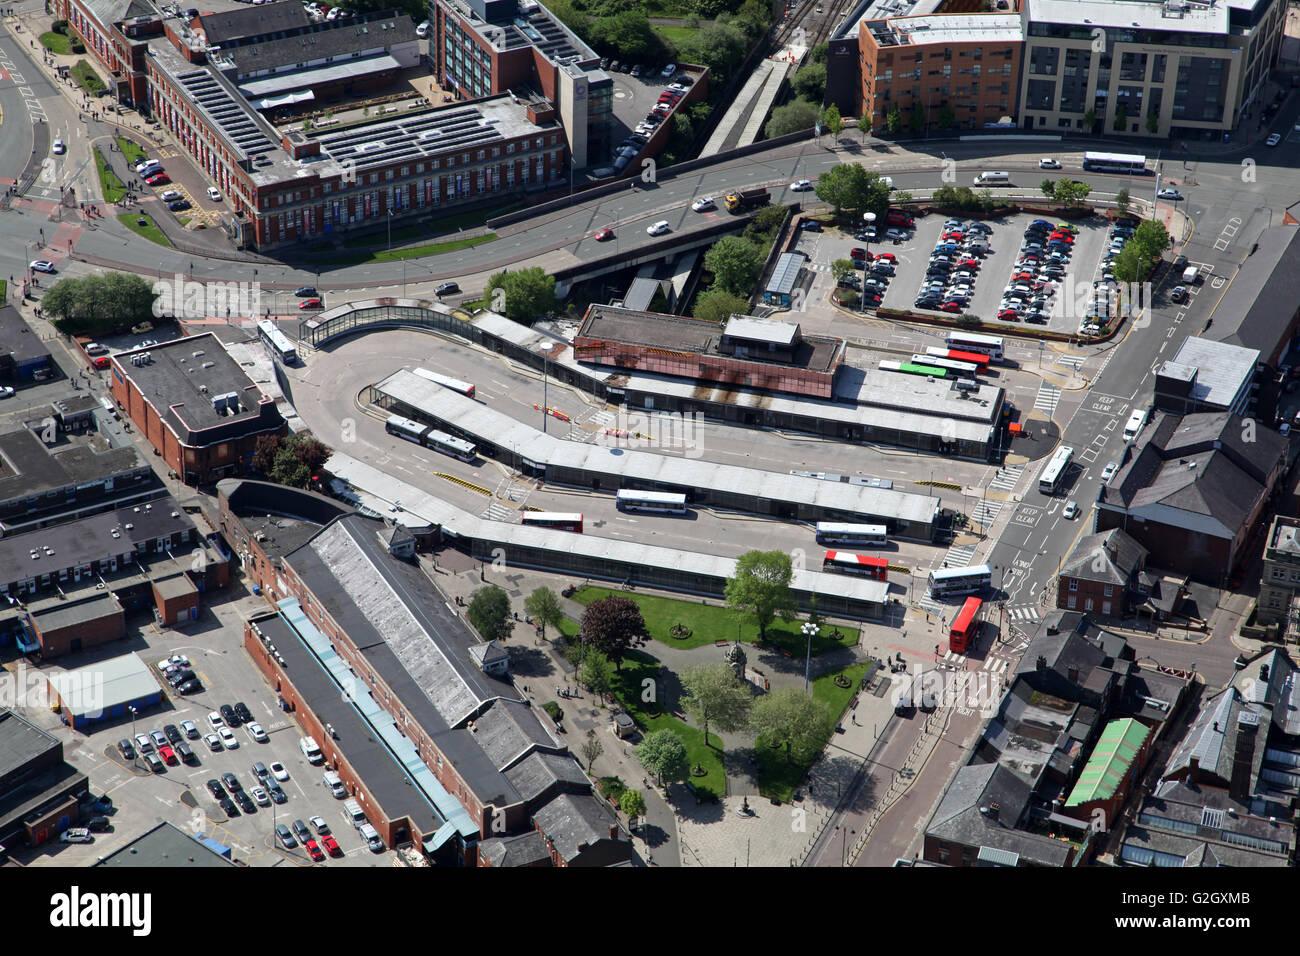 aerial view of Bury town centre bus station terminal, Lancashire, UK - Stock Image